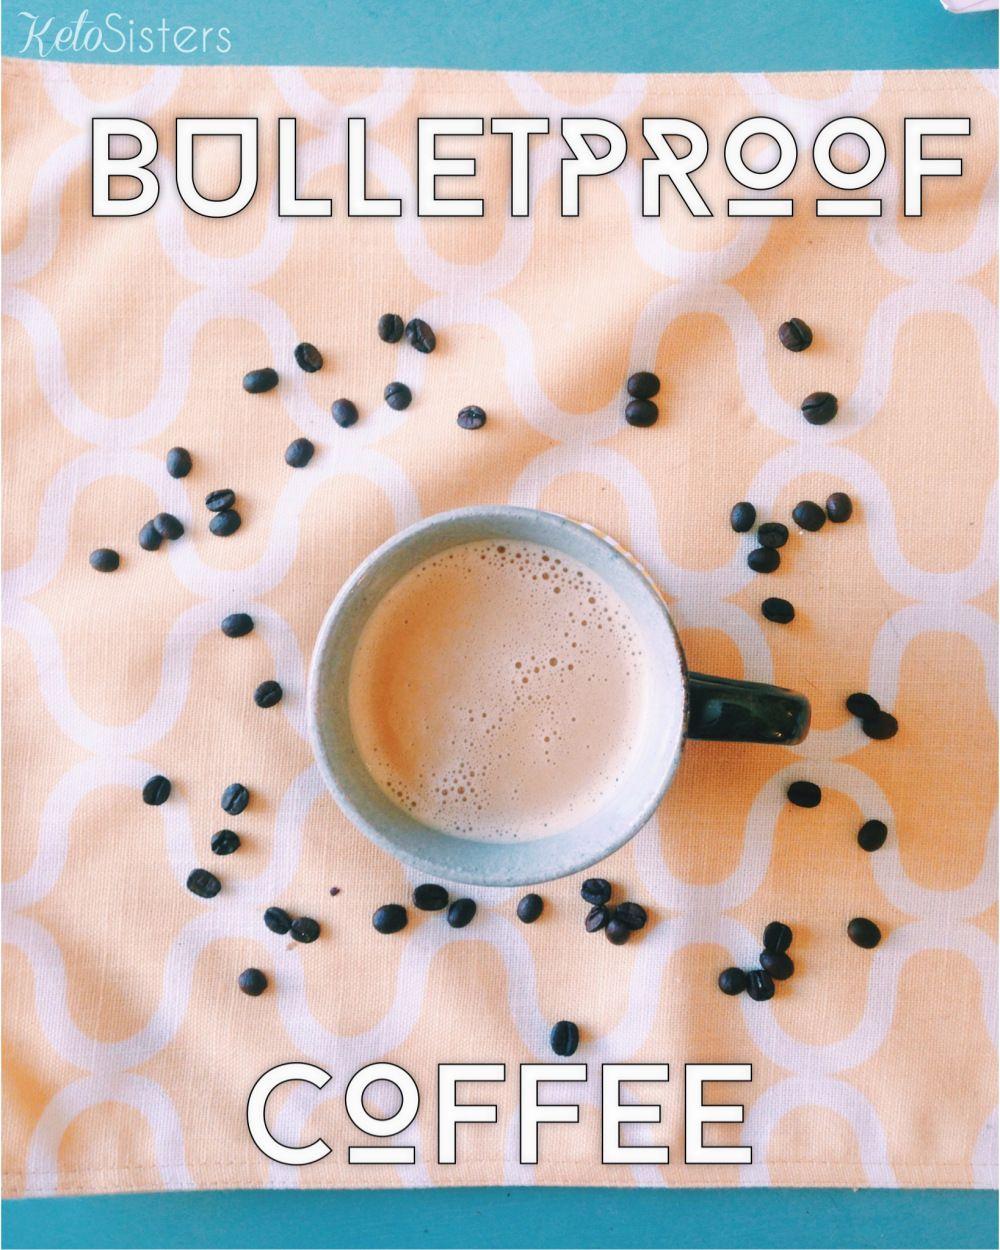 Bulletproof coffee recipe from ketosisters recipes from our blog bulletproof coffee recipe from ketosisters malvernweather Choice Image